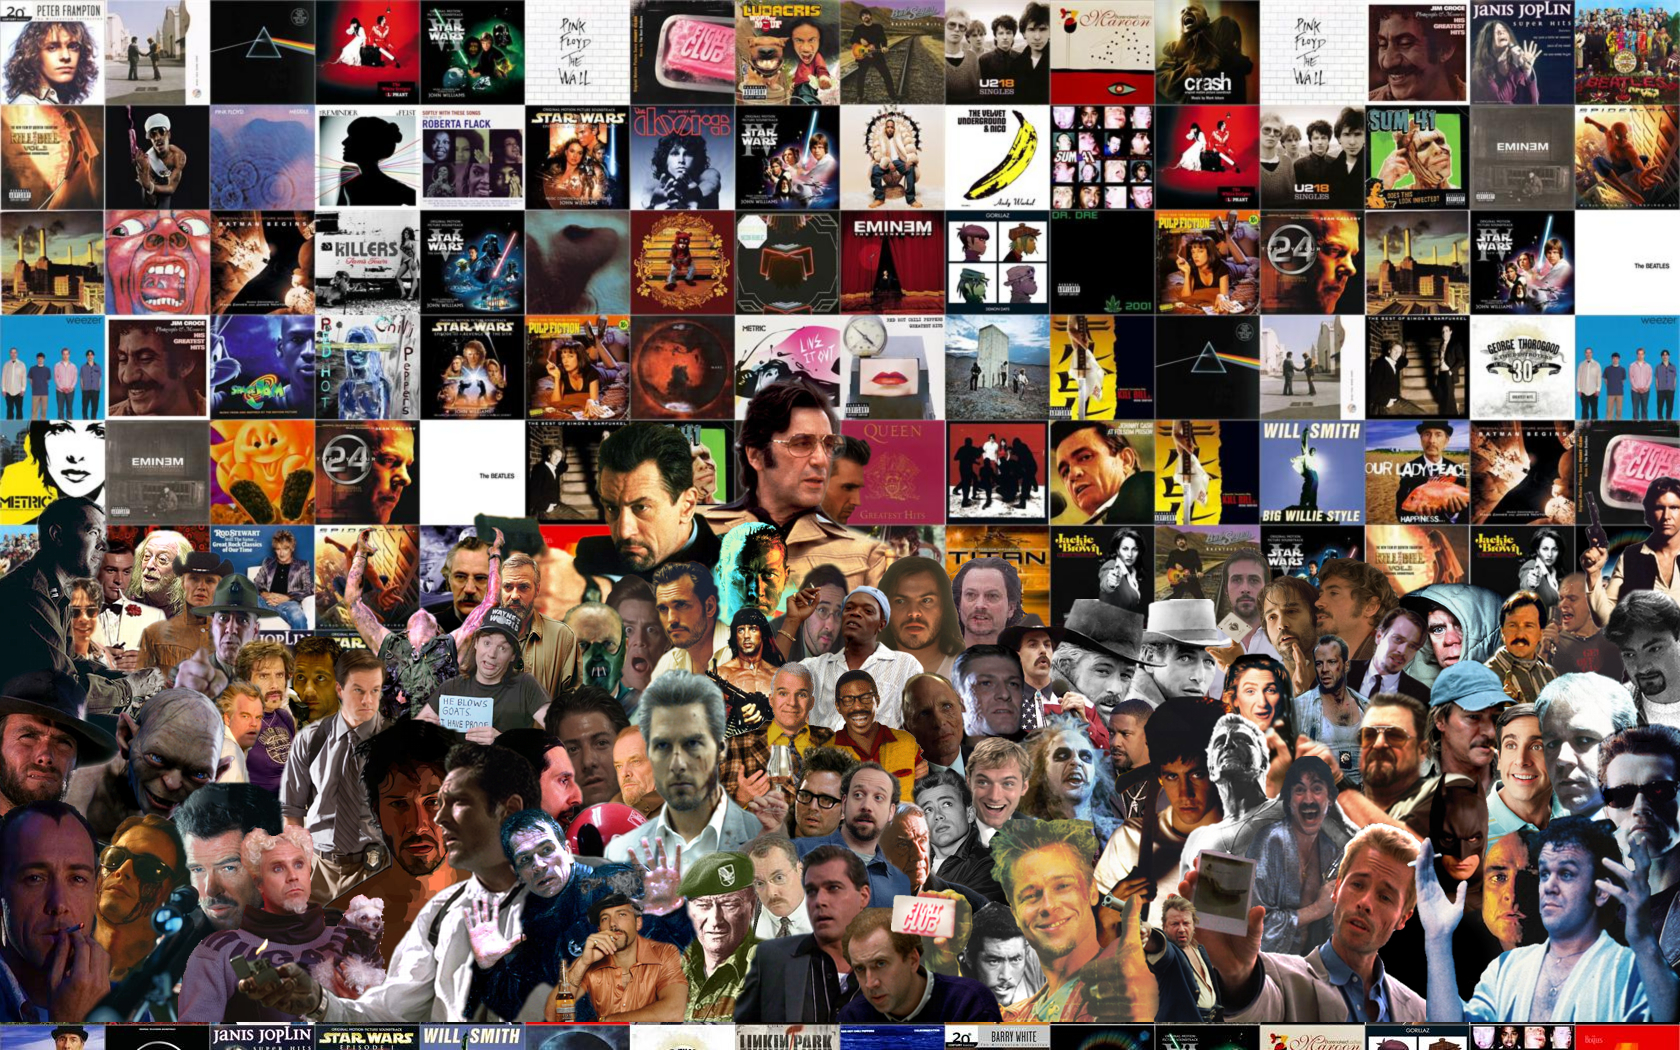 Film Album Covers Wallpaper By Wiseguy 174 On Deviantart